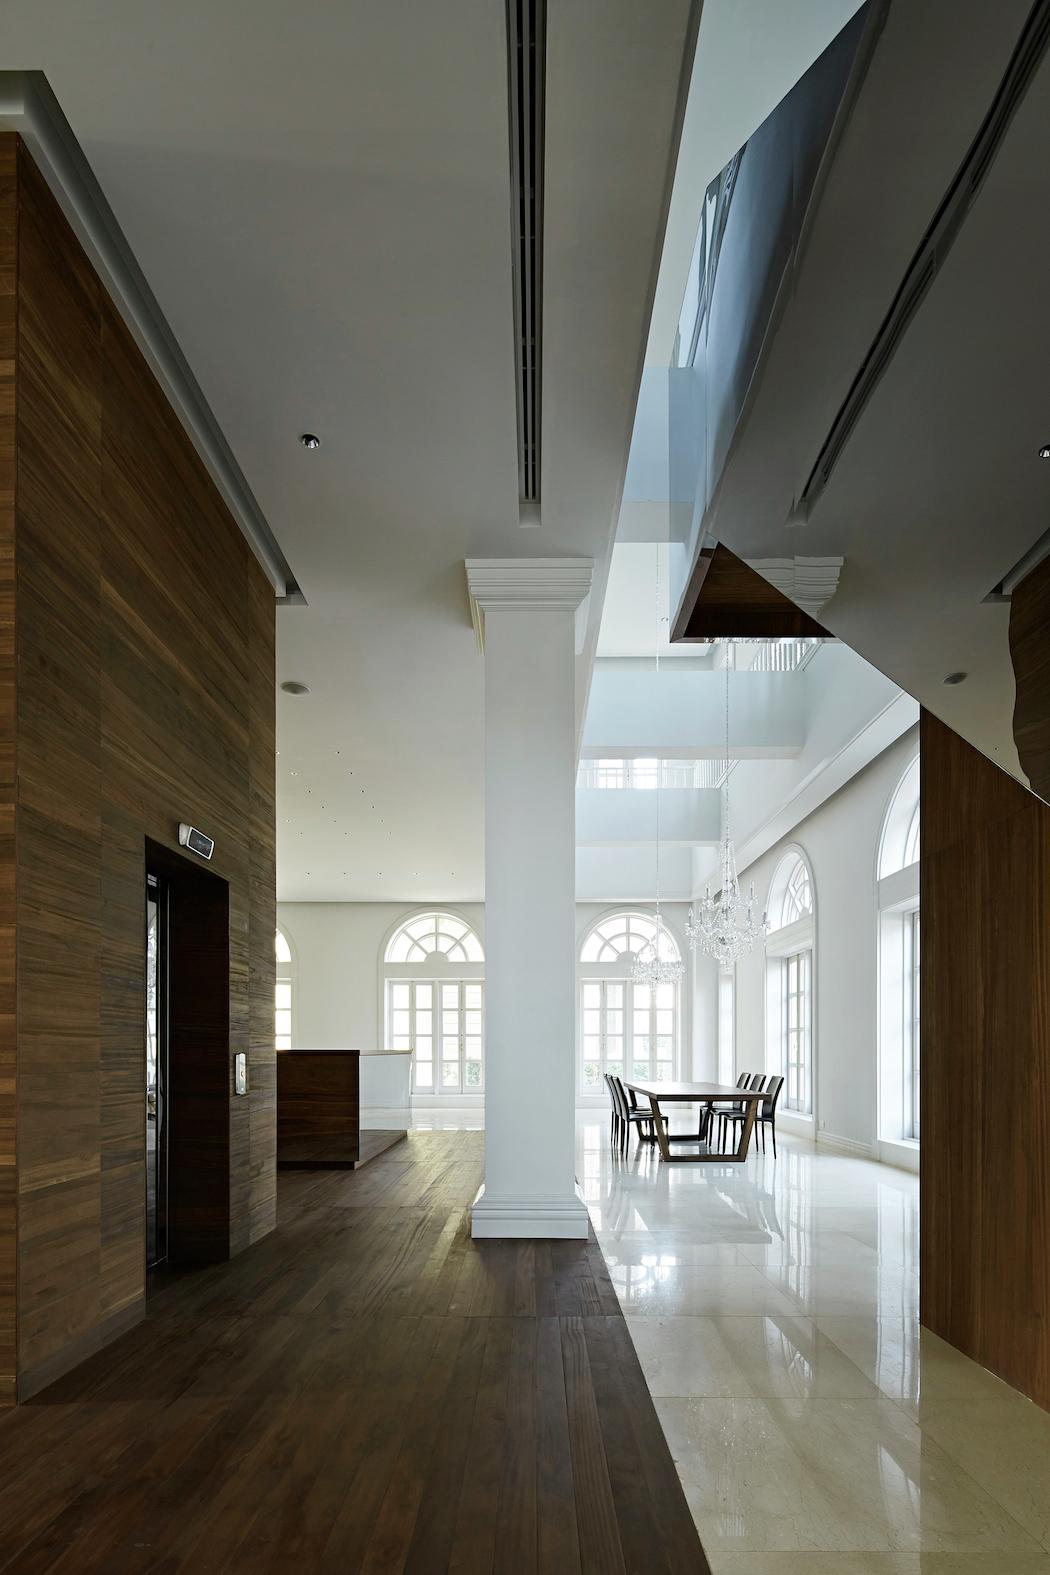 House in Pakse : Makoto Yamaguchi Design 5